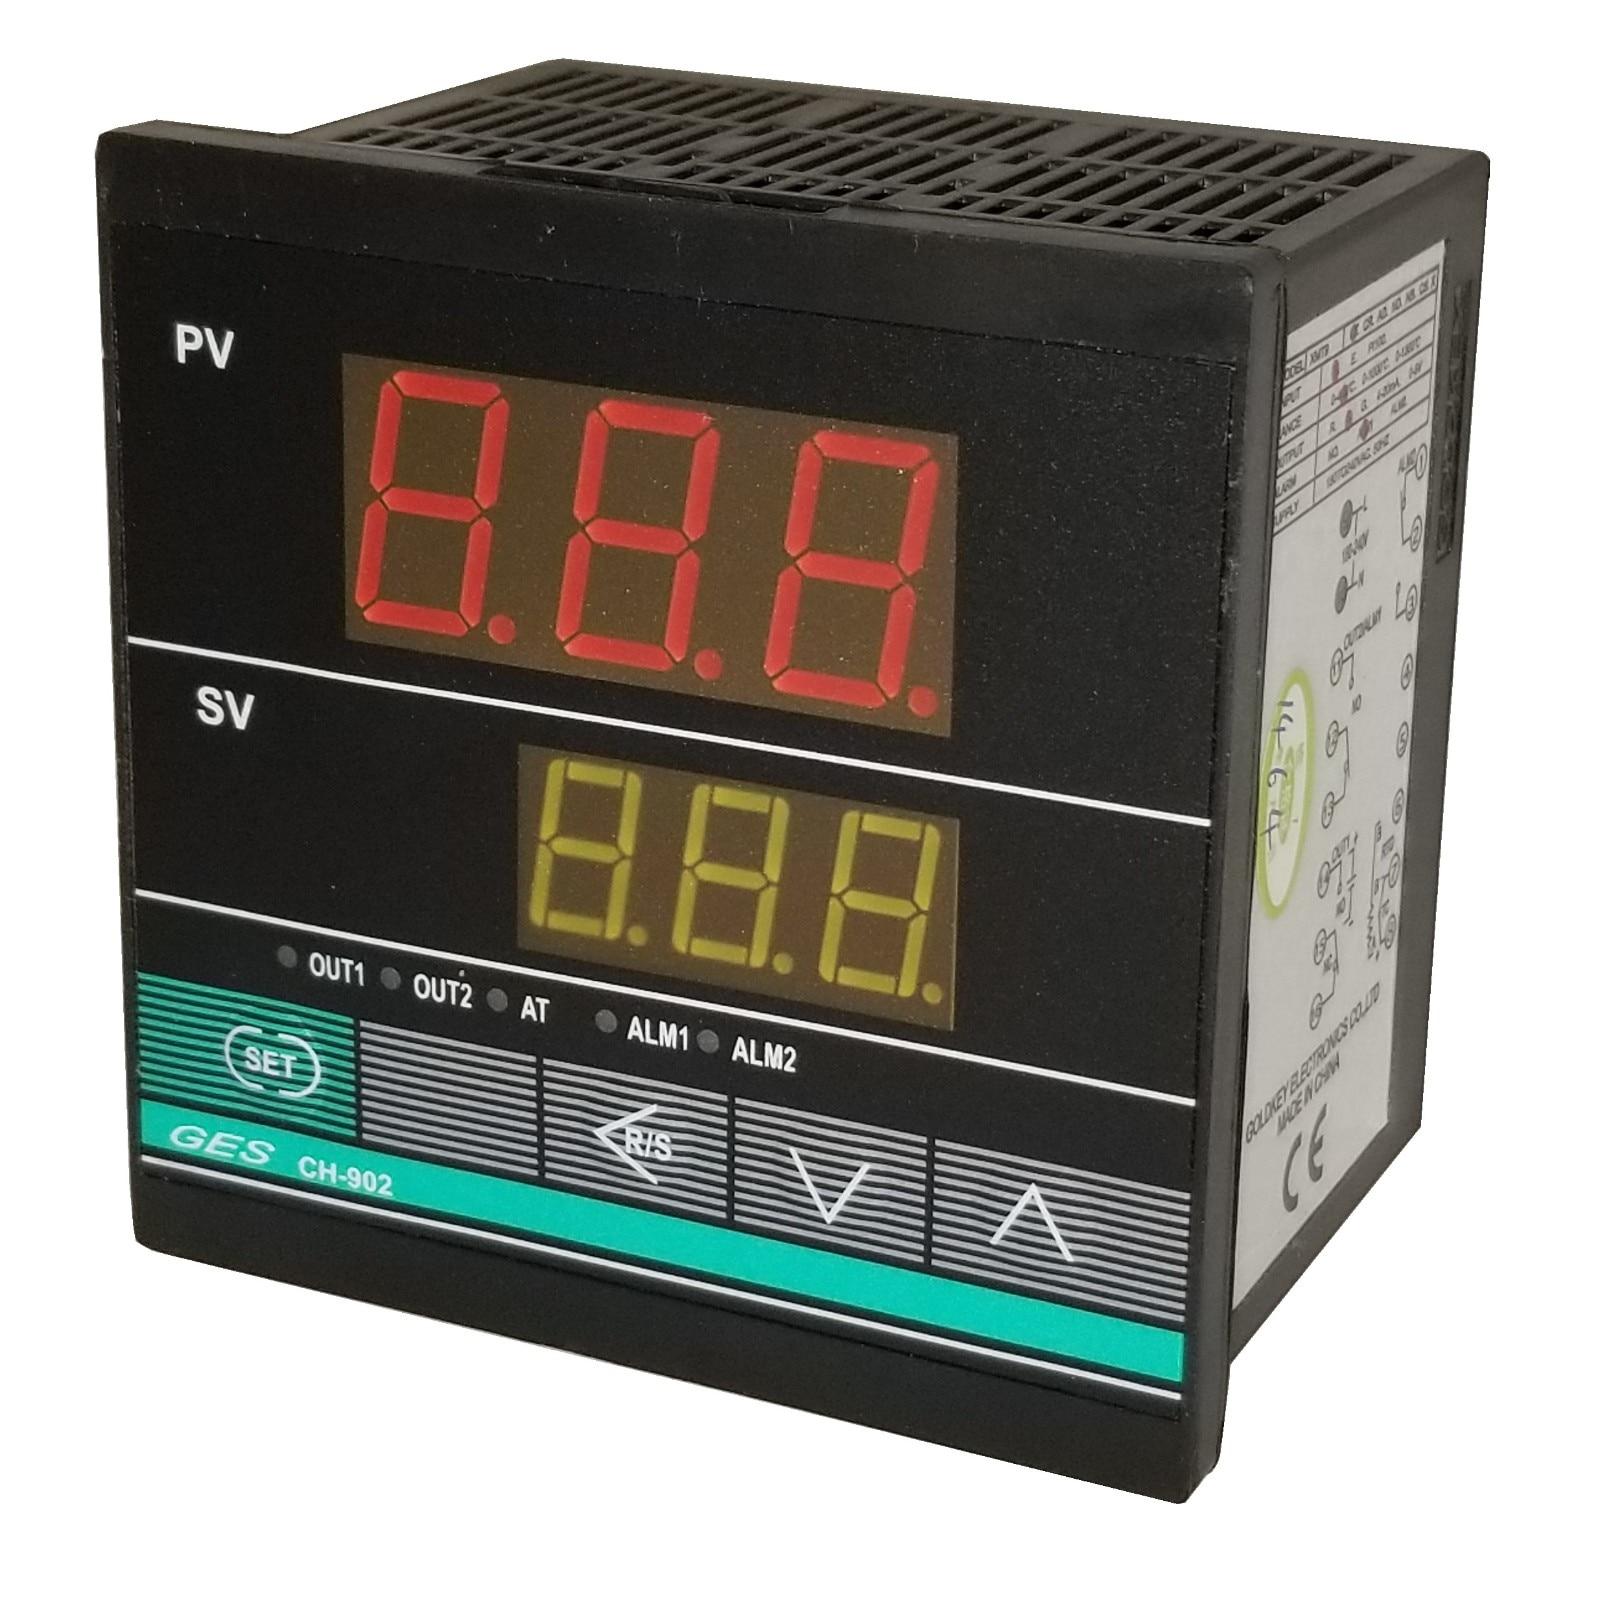 GDK XMT-9 XHD902 CHD902 K E PT100 pulso de voltaje 0-400 relé controlador de temperatura electrónico de carcasa corta-5 unids/lote